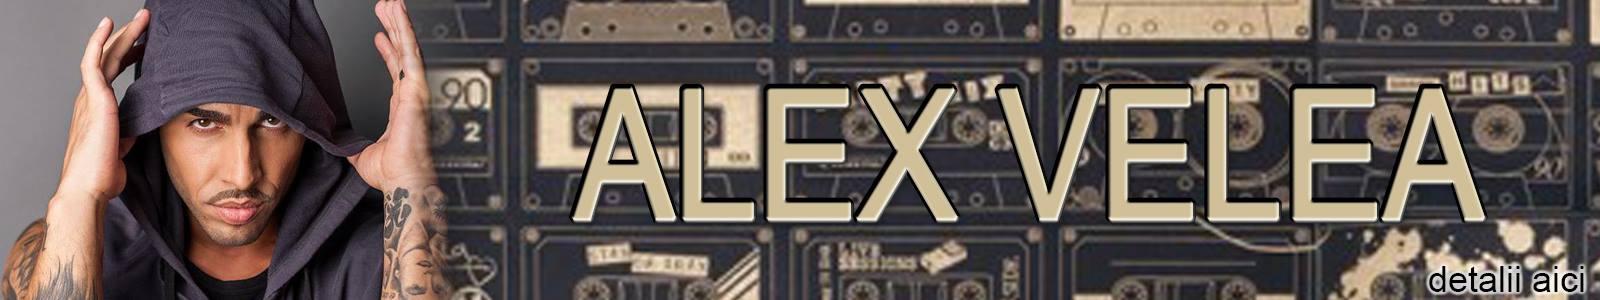 contact-alex-velea-pret-nunta-pret-evenimente